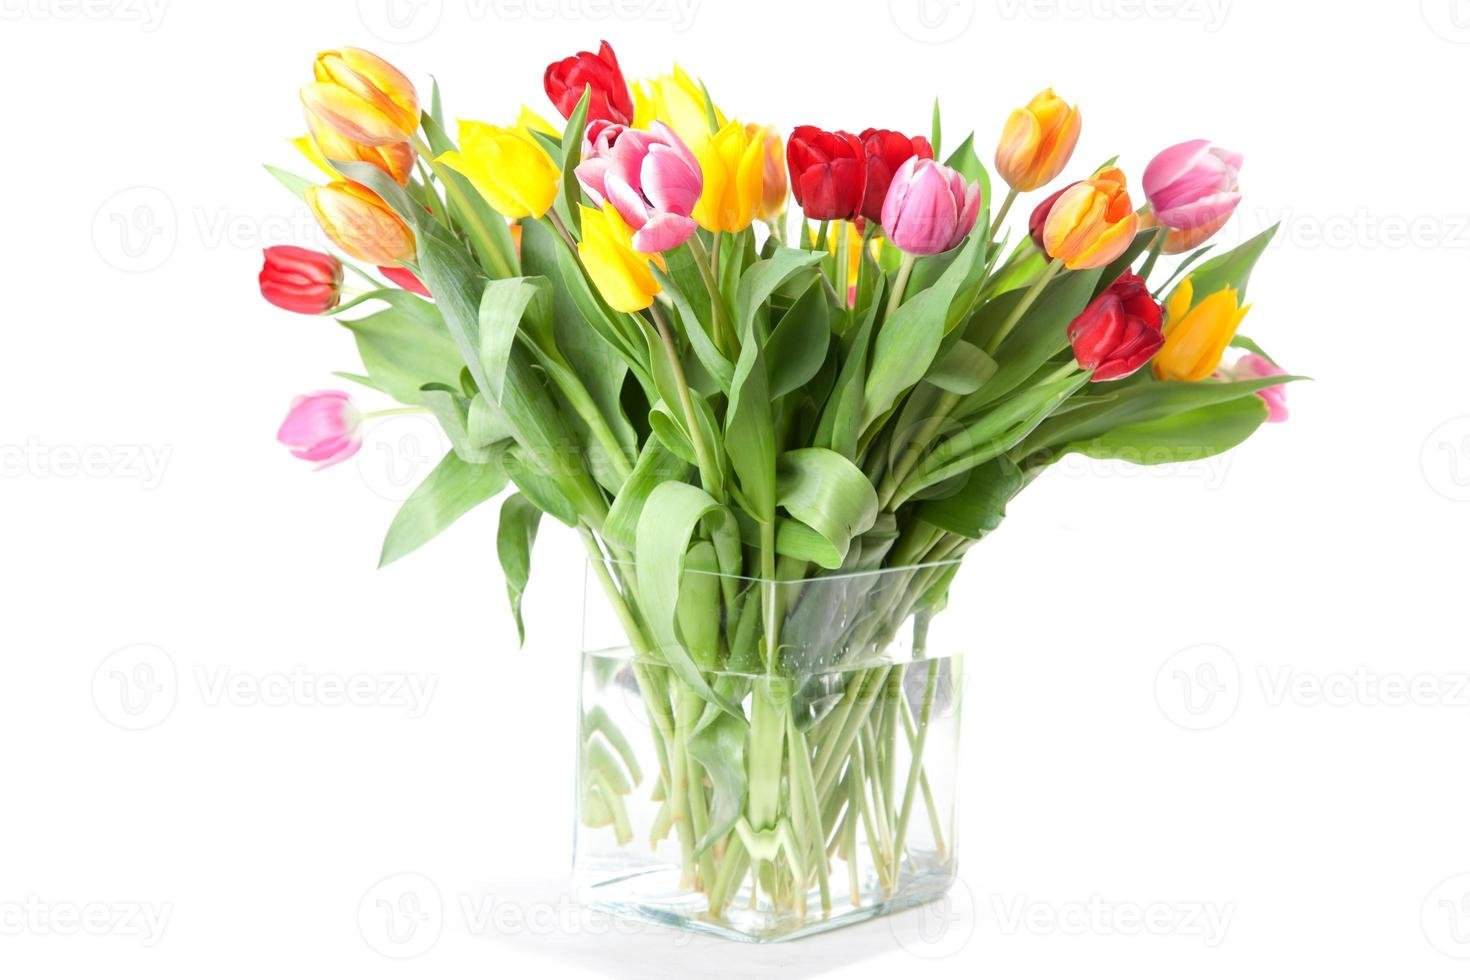 tulipanes de colores vibrantes foto